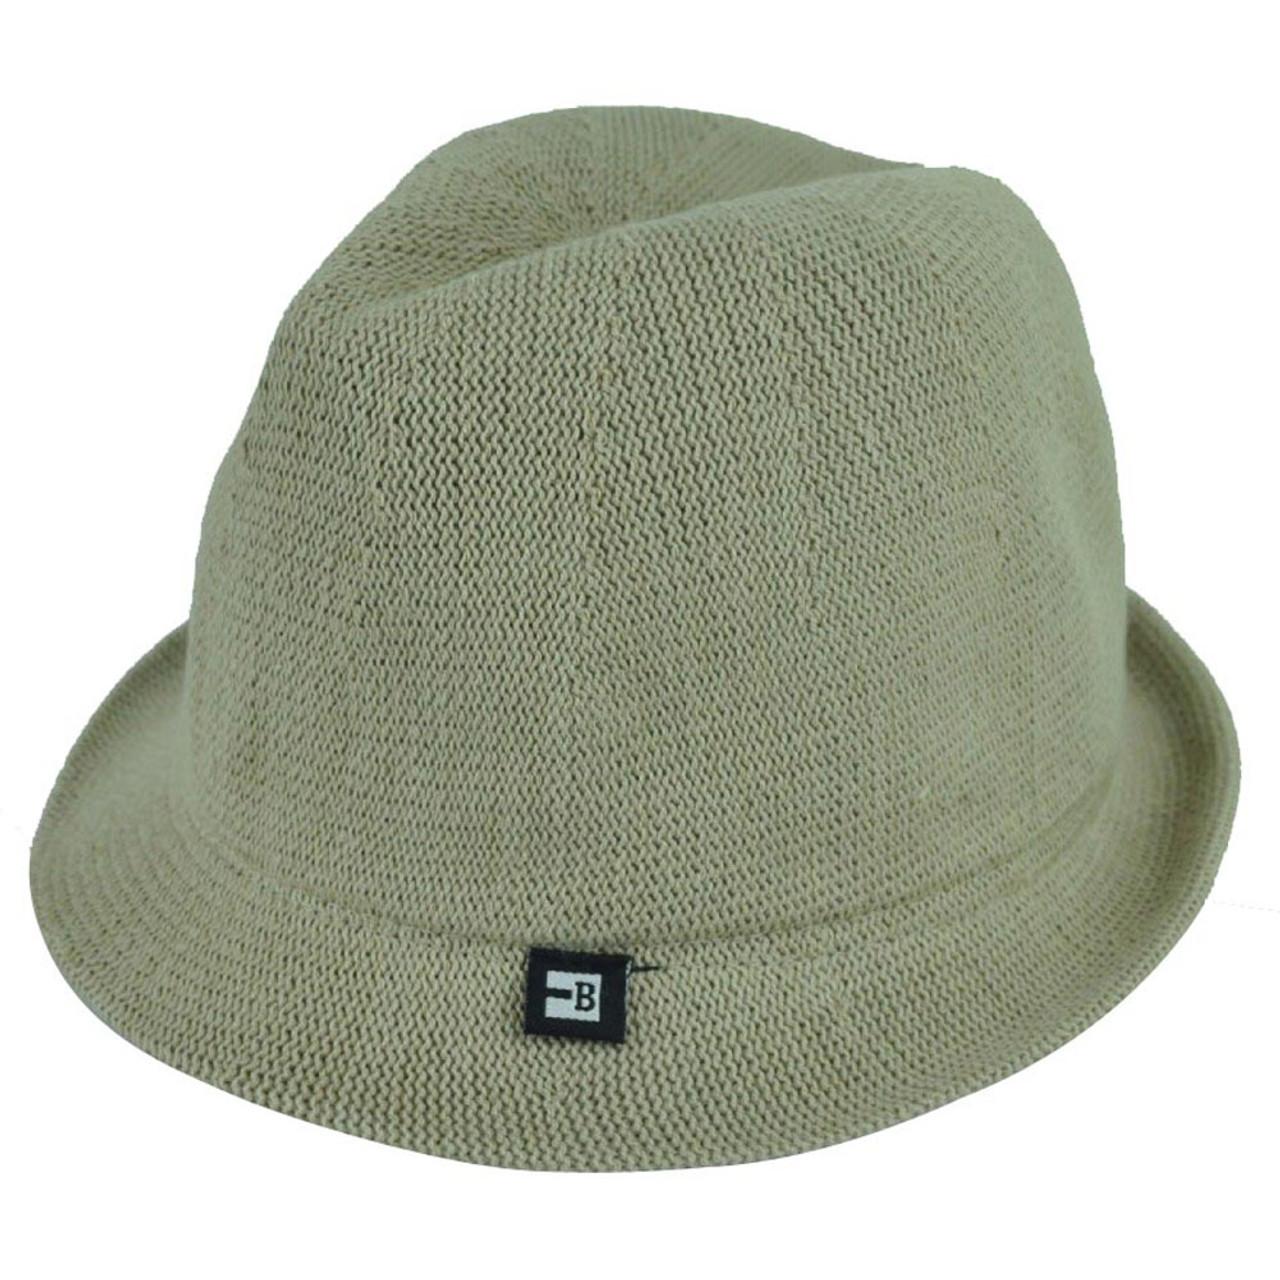 1db6bbfe858bc Block Headwear Dune Fedora Medium Relax Gangster Trilby Stetson Hat Solid  Khaki - Cap Store Online.com